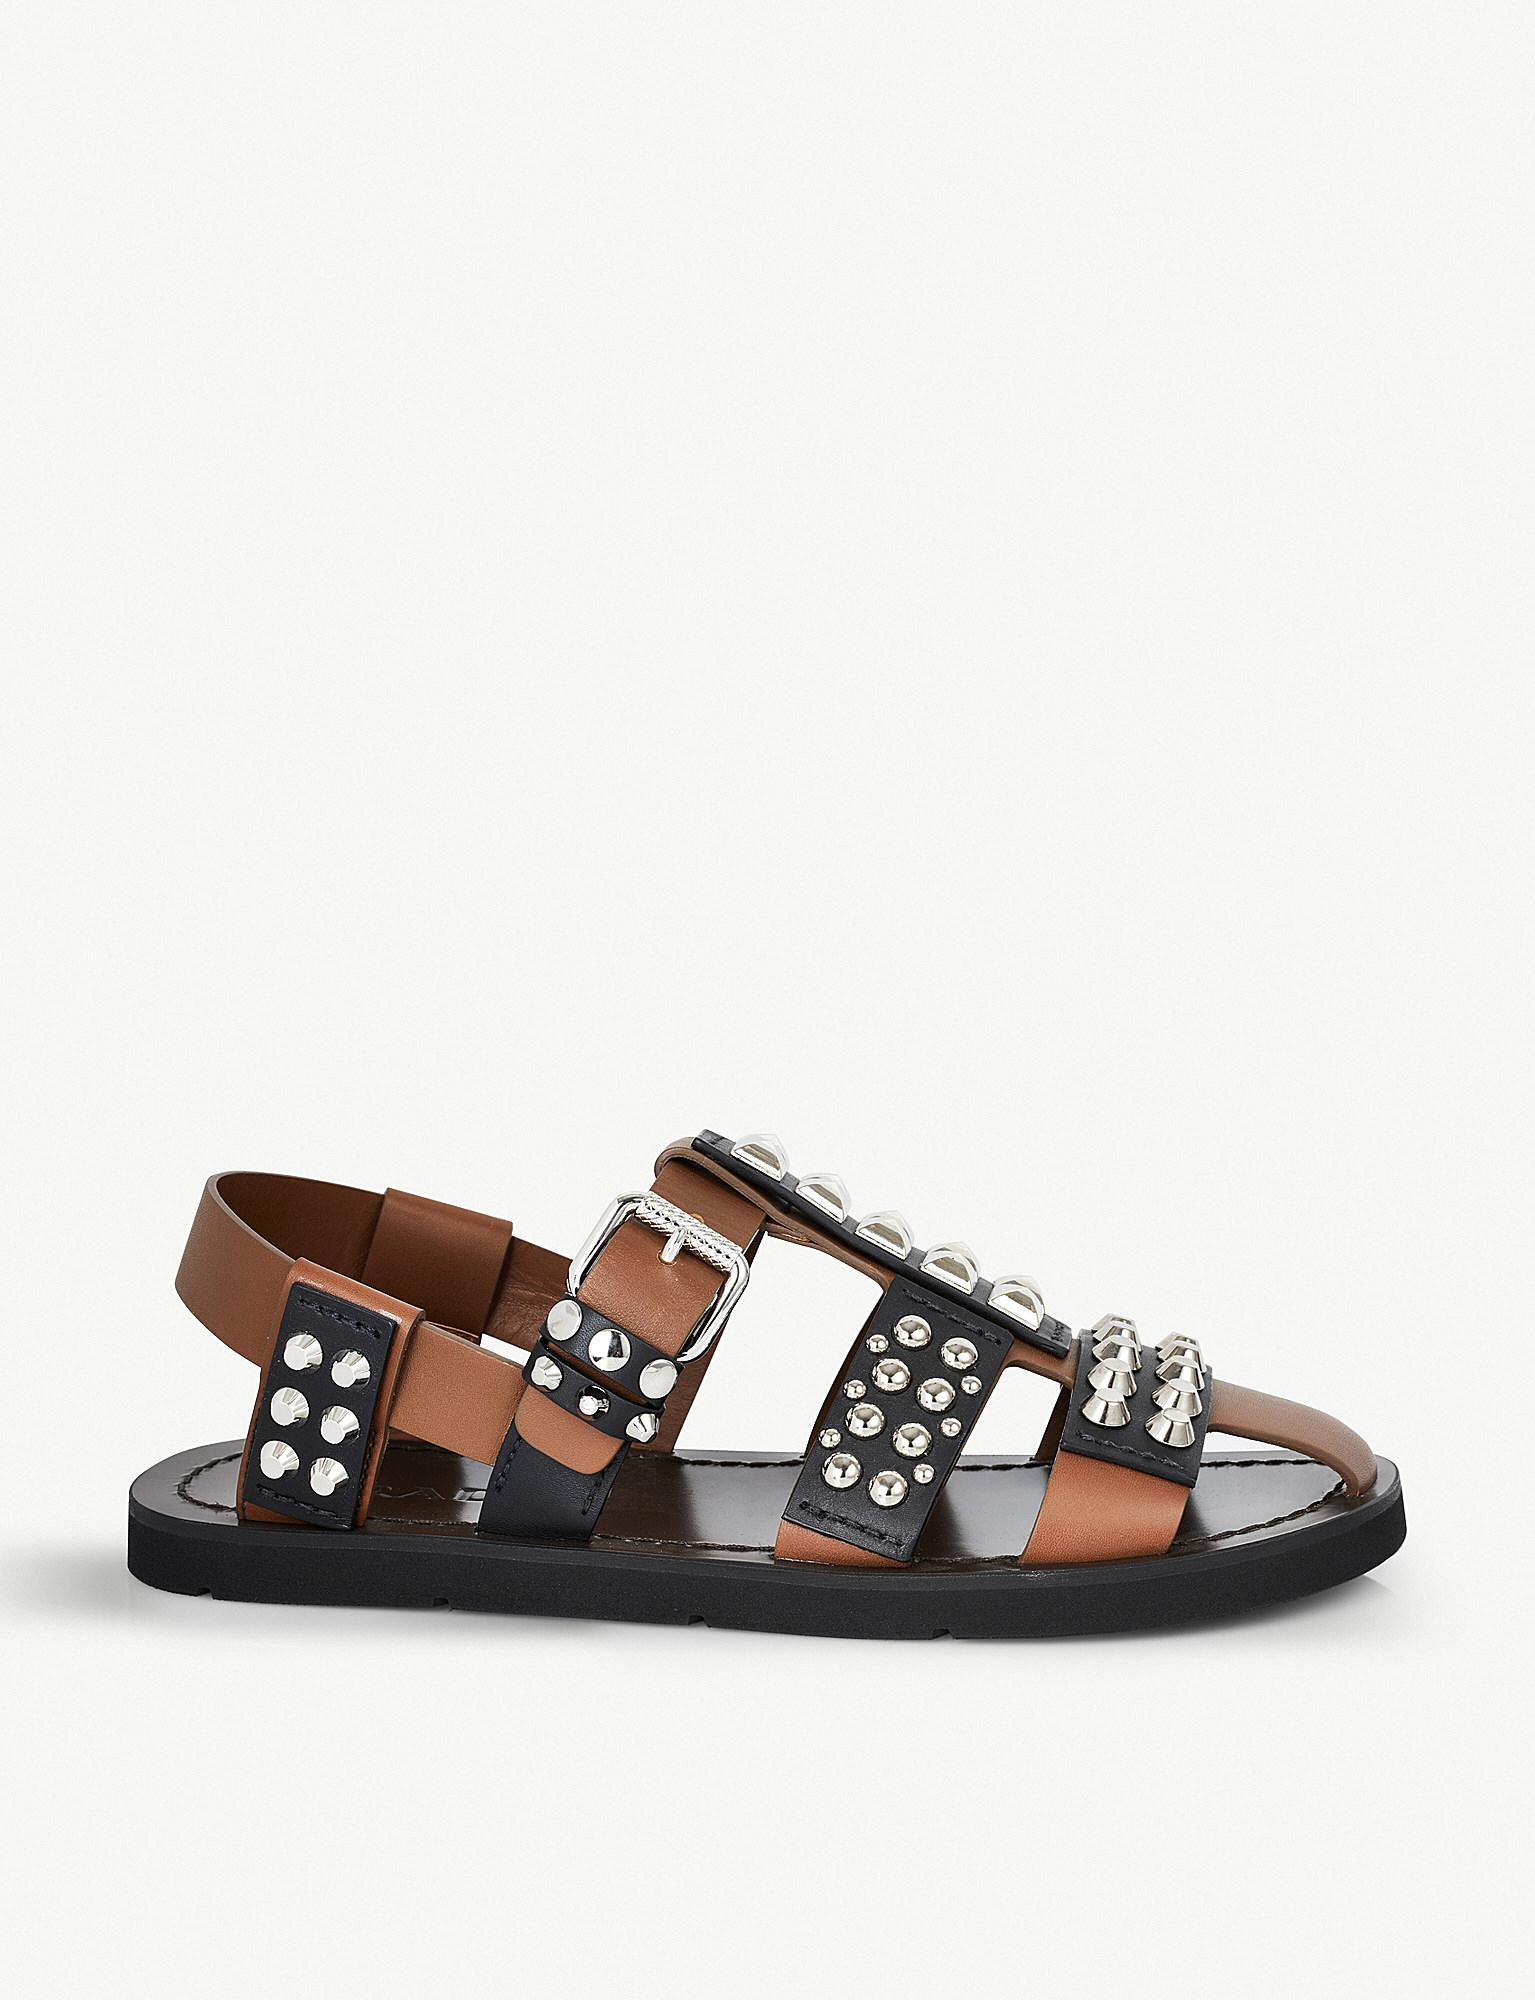 634b2fe05503f Lyst - Prada Fisherman Studded Leather Sandals in Black for Men